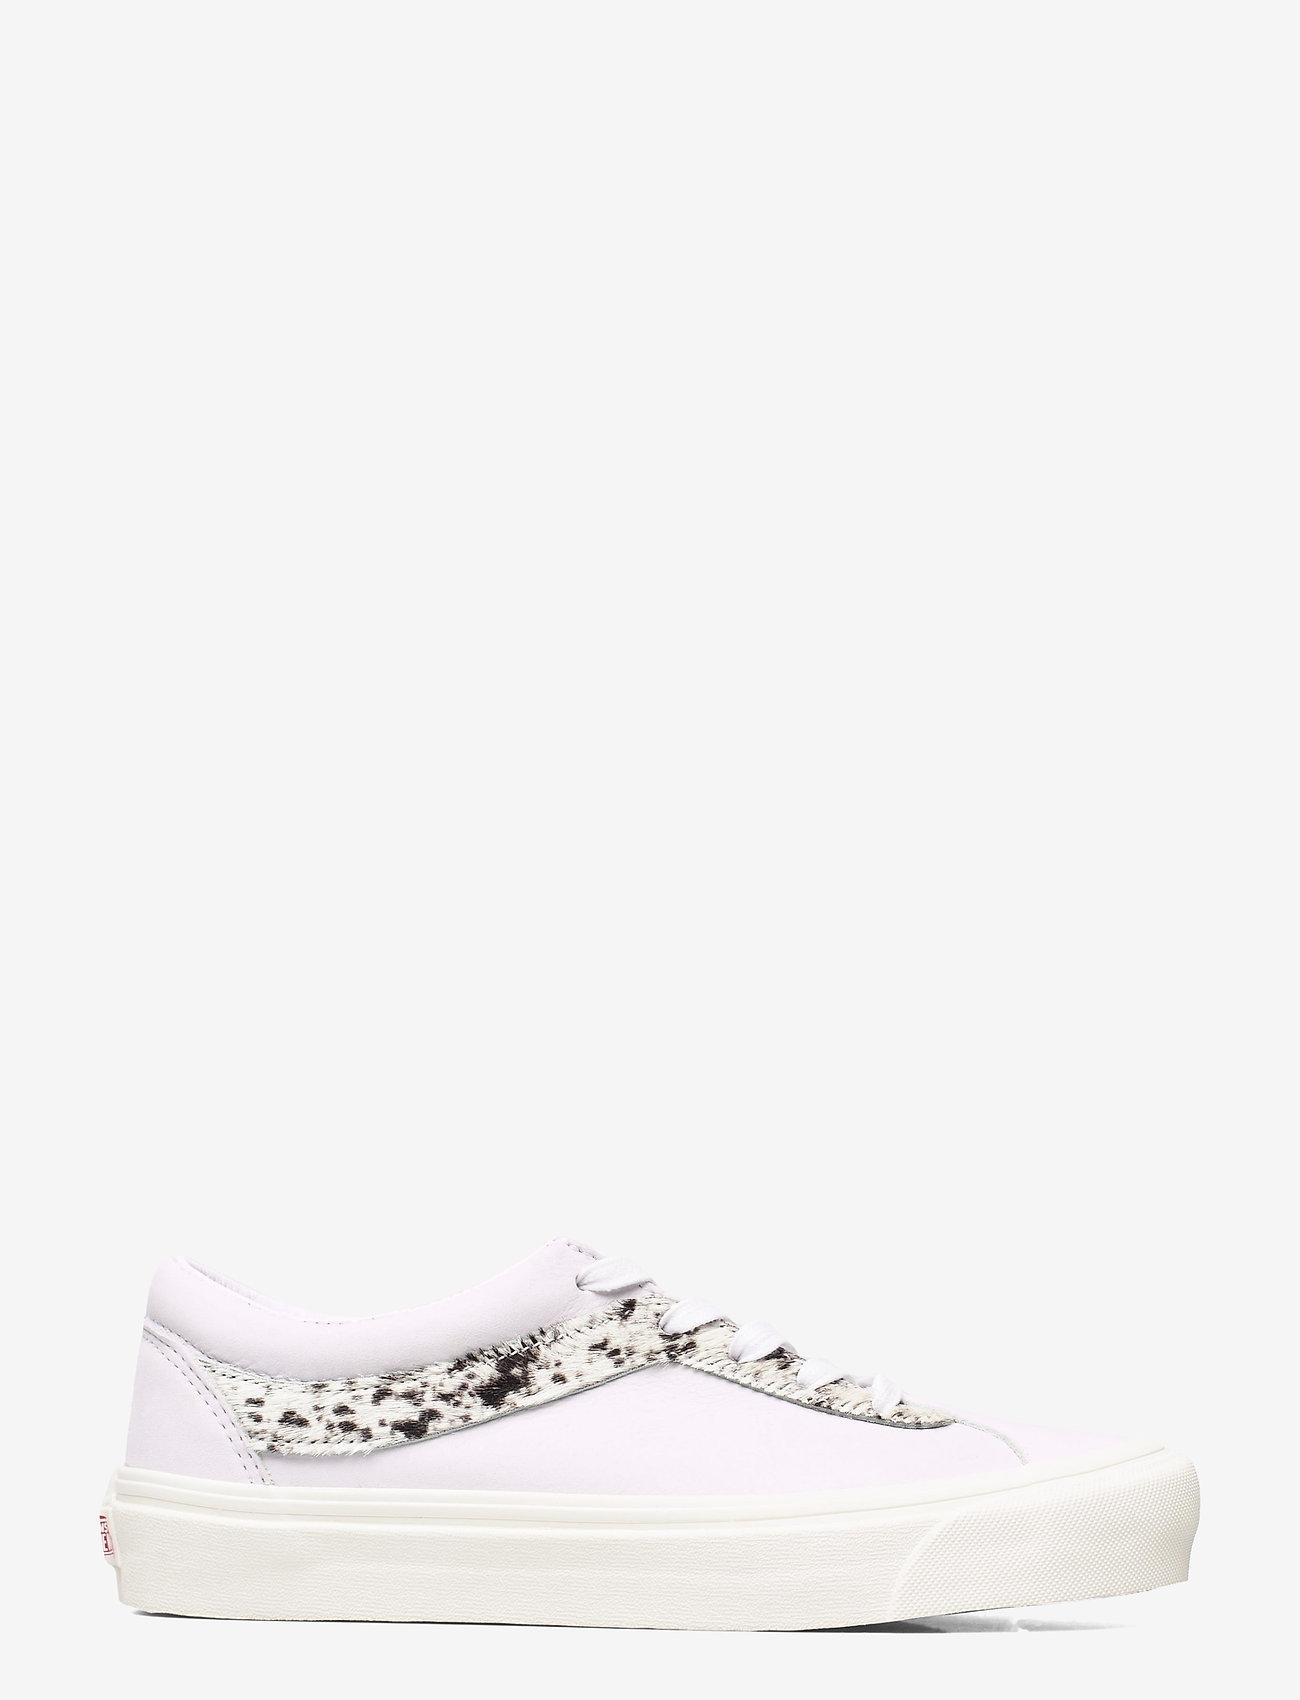 VANS - Shoe Adult Unisex Numeric Wid - laag sneakers - (pony) true white/pony - 1